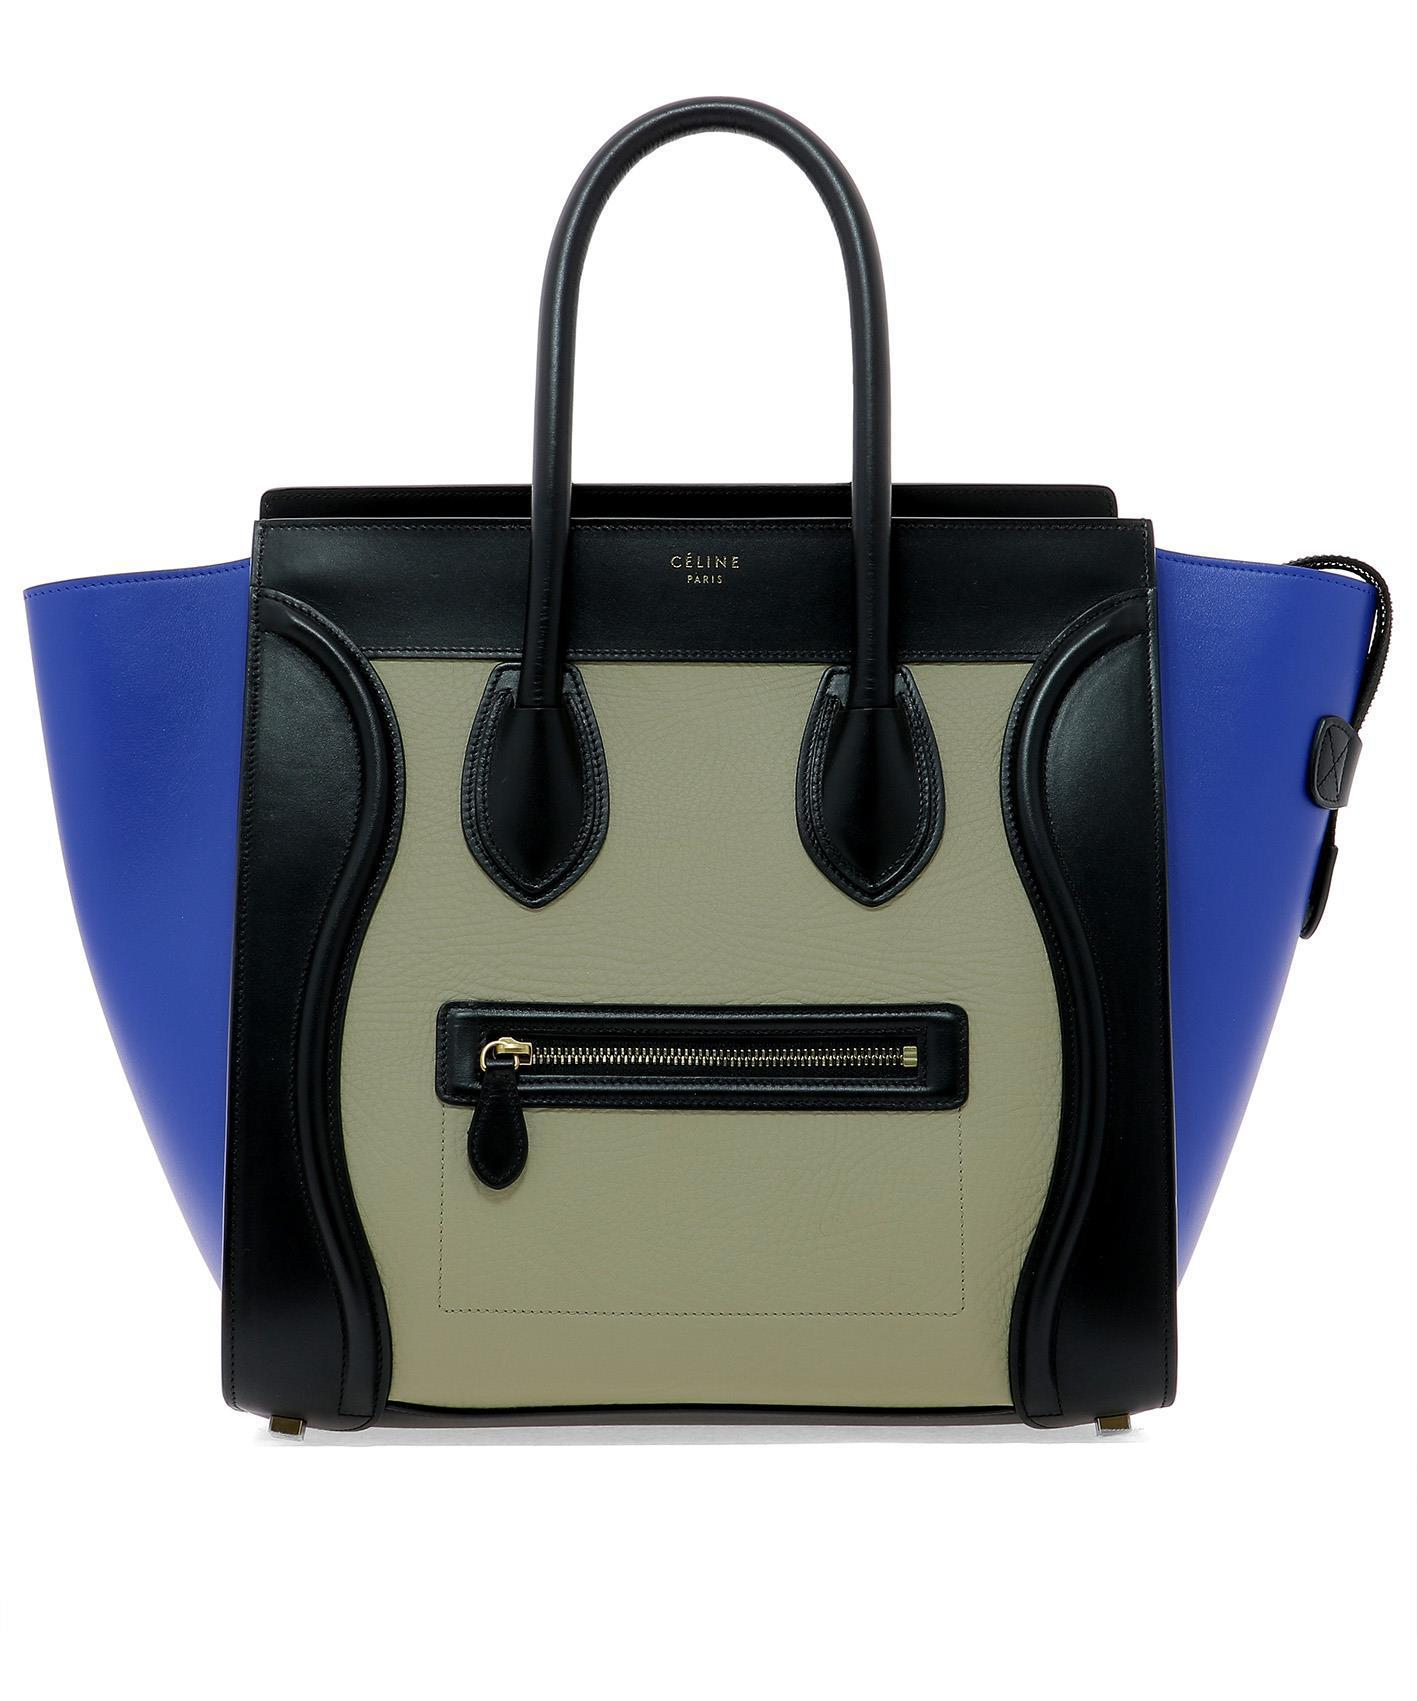 Lyst - Céline Luggage Tote Bag in Blue aadfcb0e02395